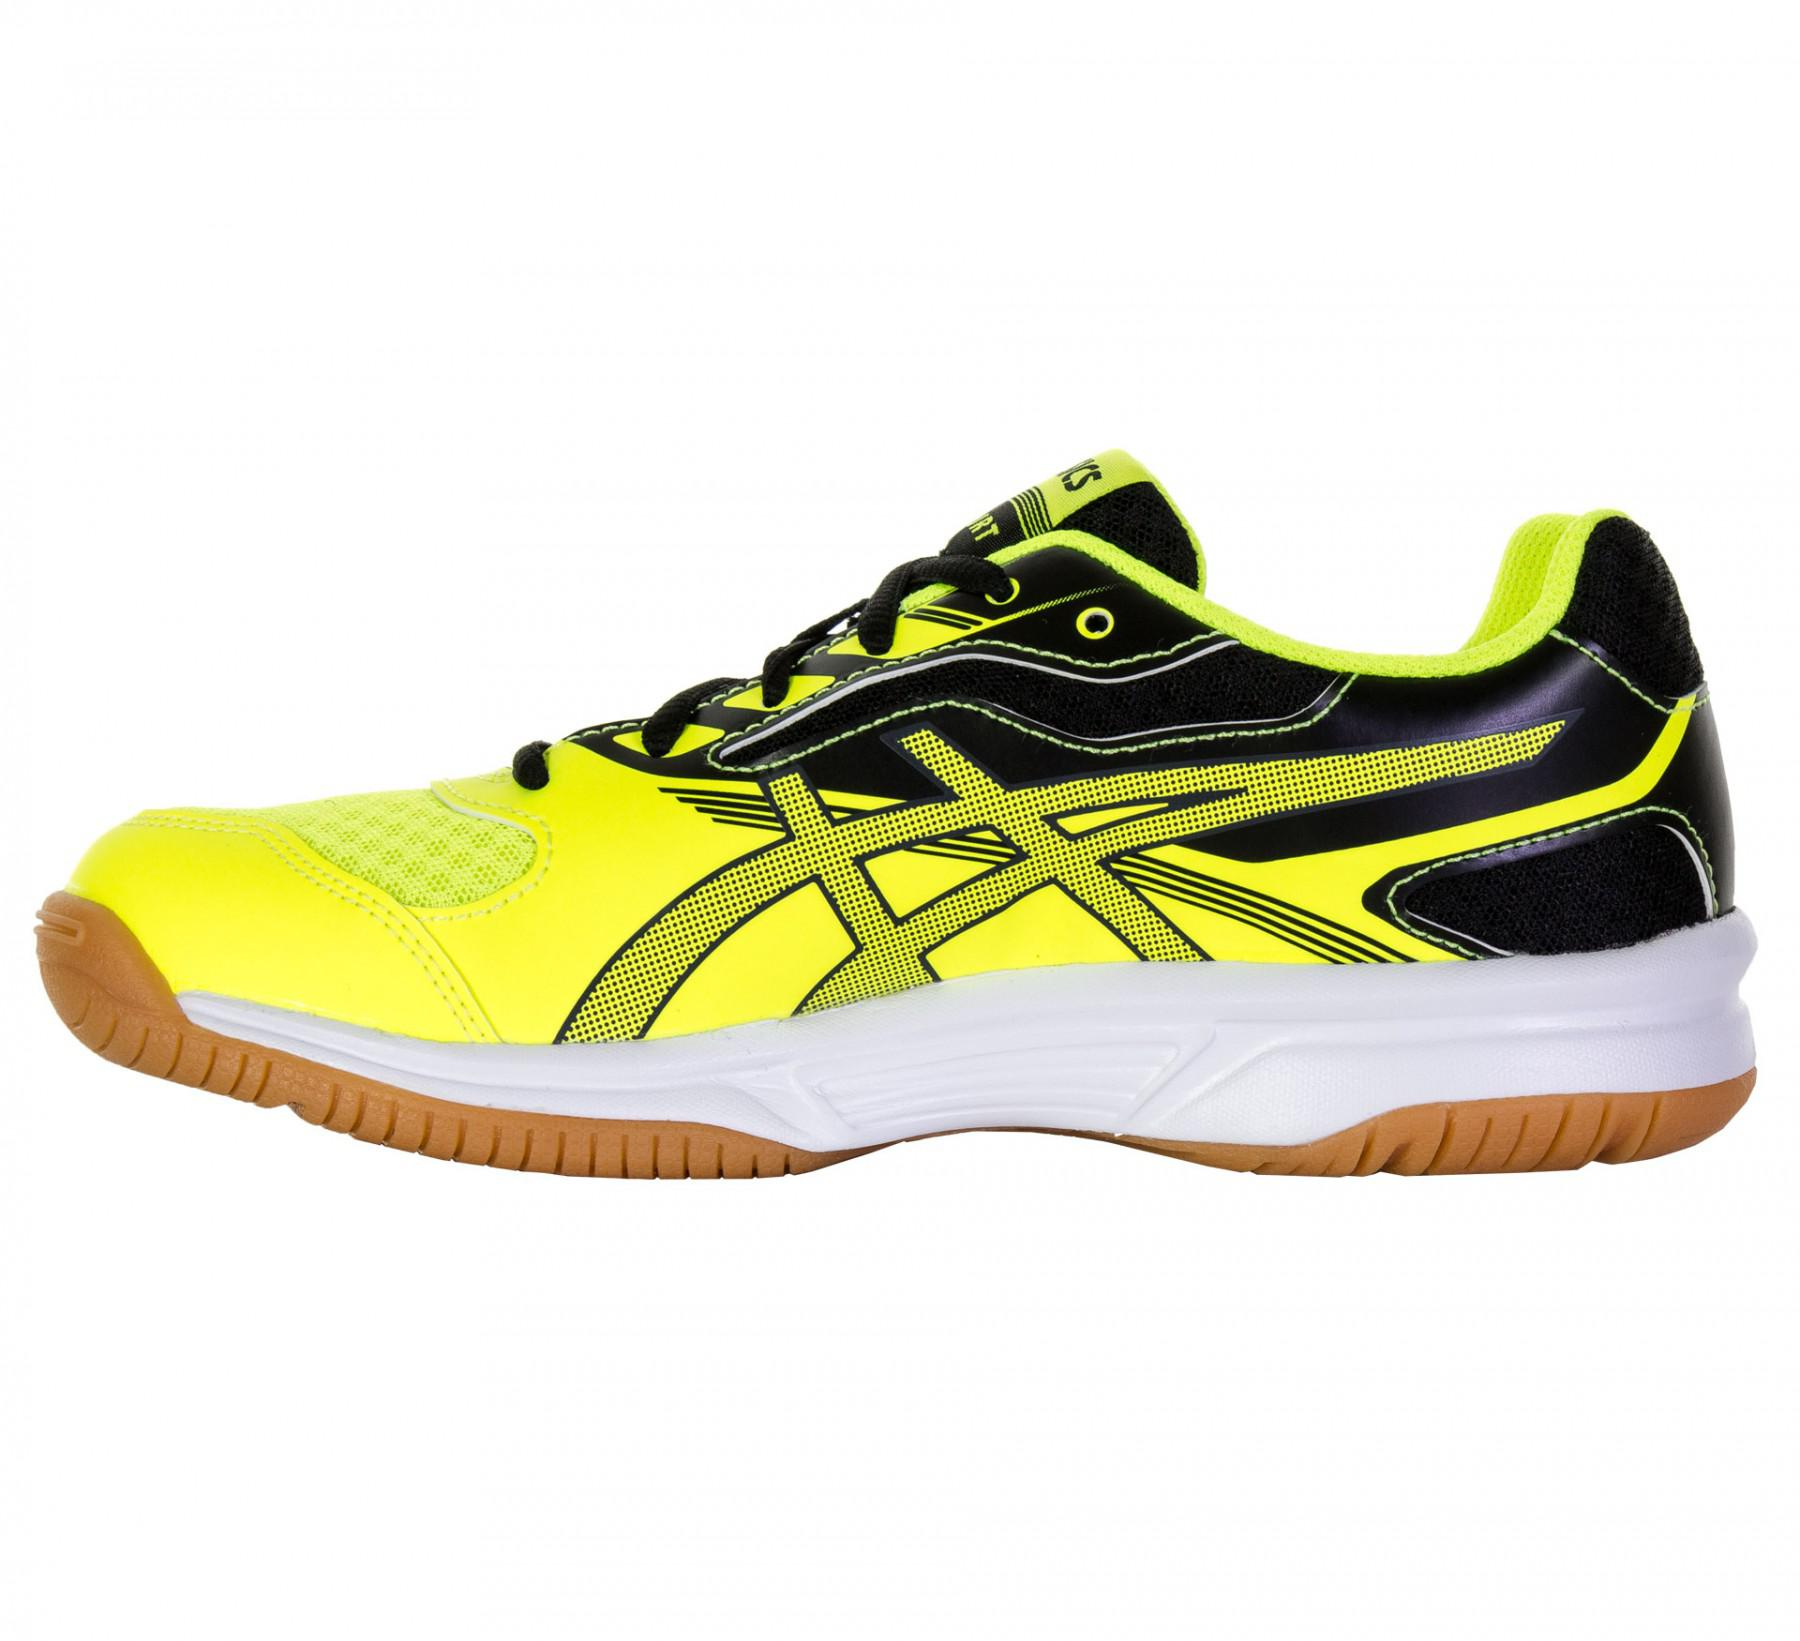 d63e24232b0 Asics Kids GEL-Upcourt 2 GS Indoor Court Shoes - Safety Yellow/Black ...